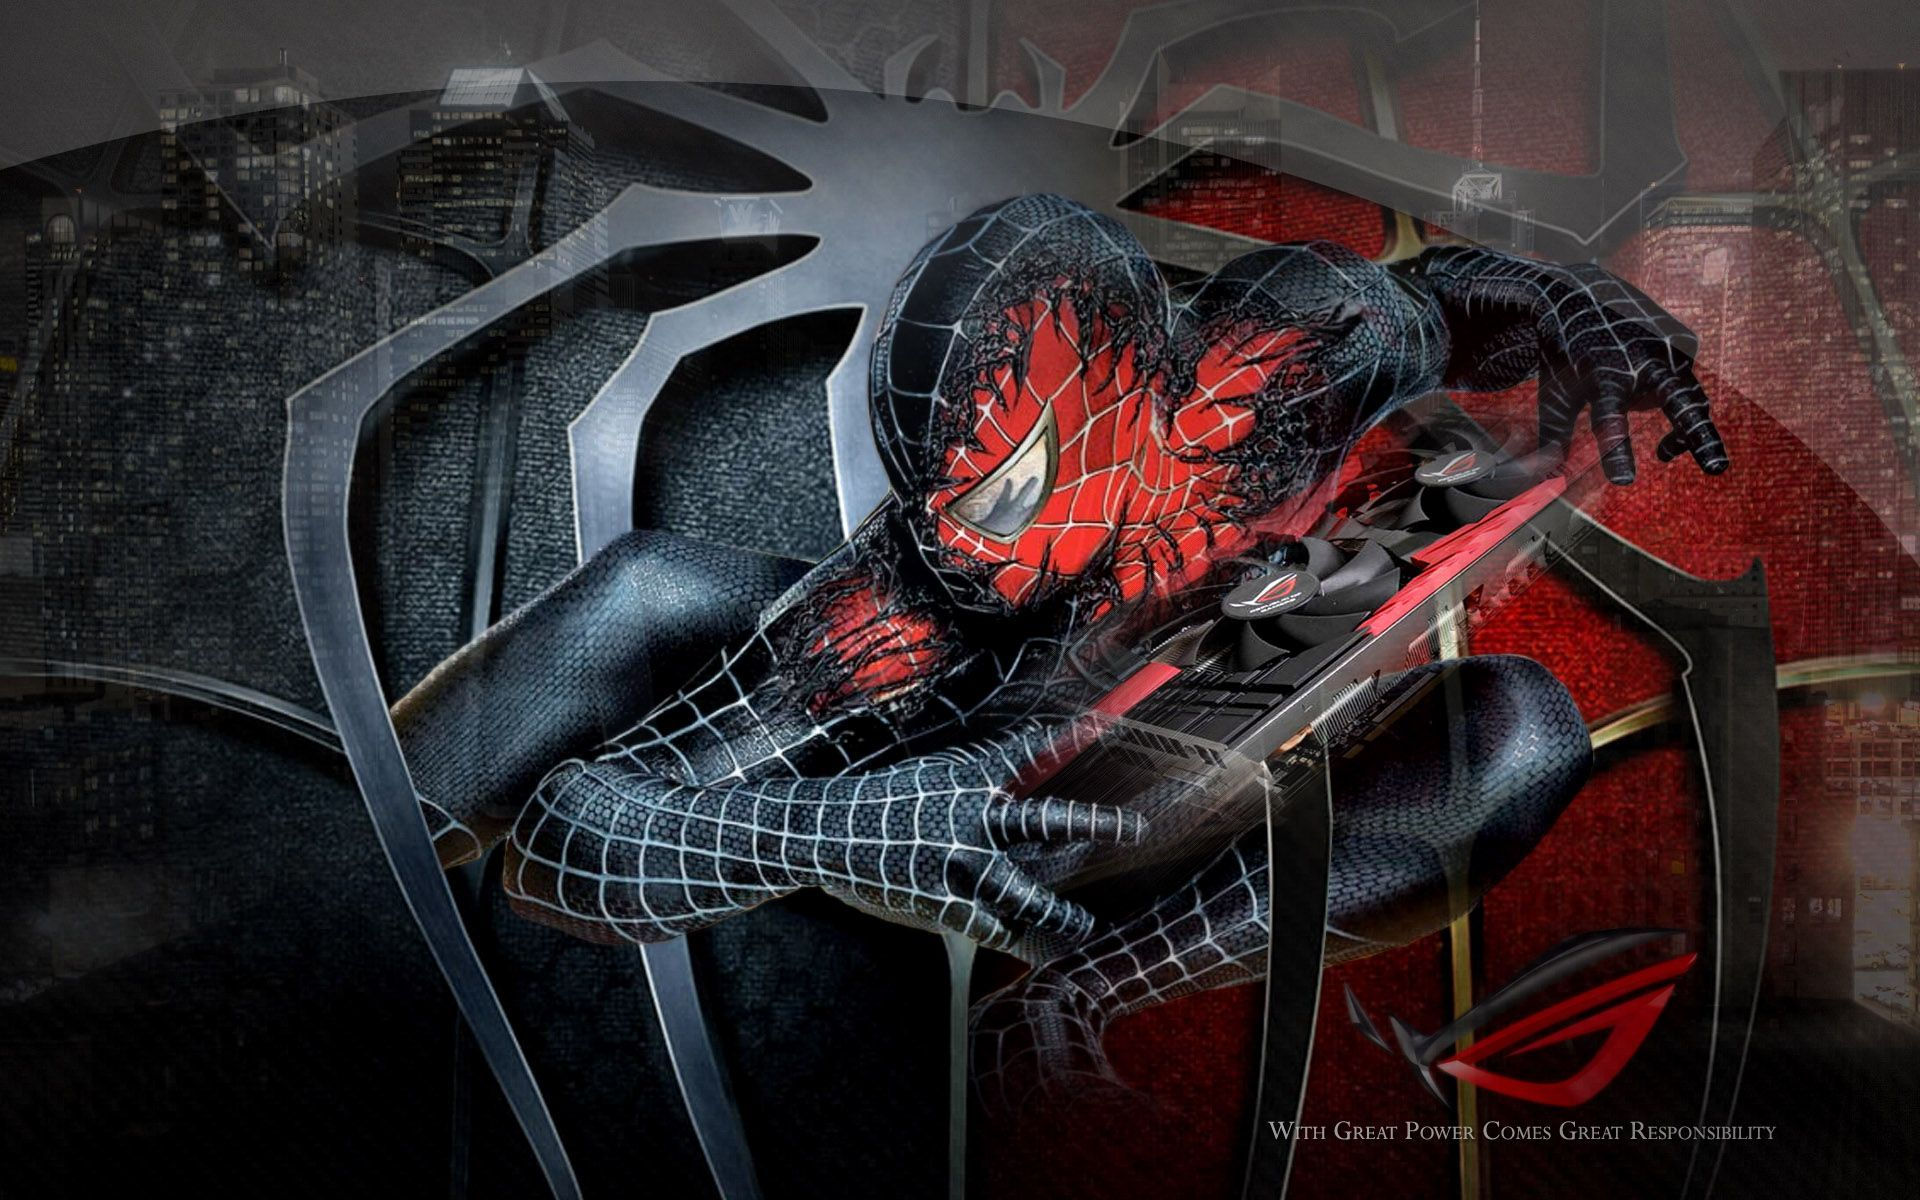 Pin By Williams J On Marvel Man Wallpaper Spiderman Spiderman 3 Wallpaper